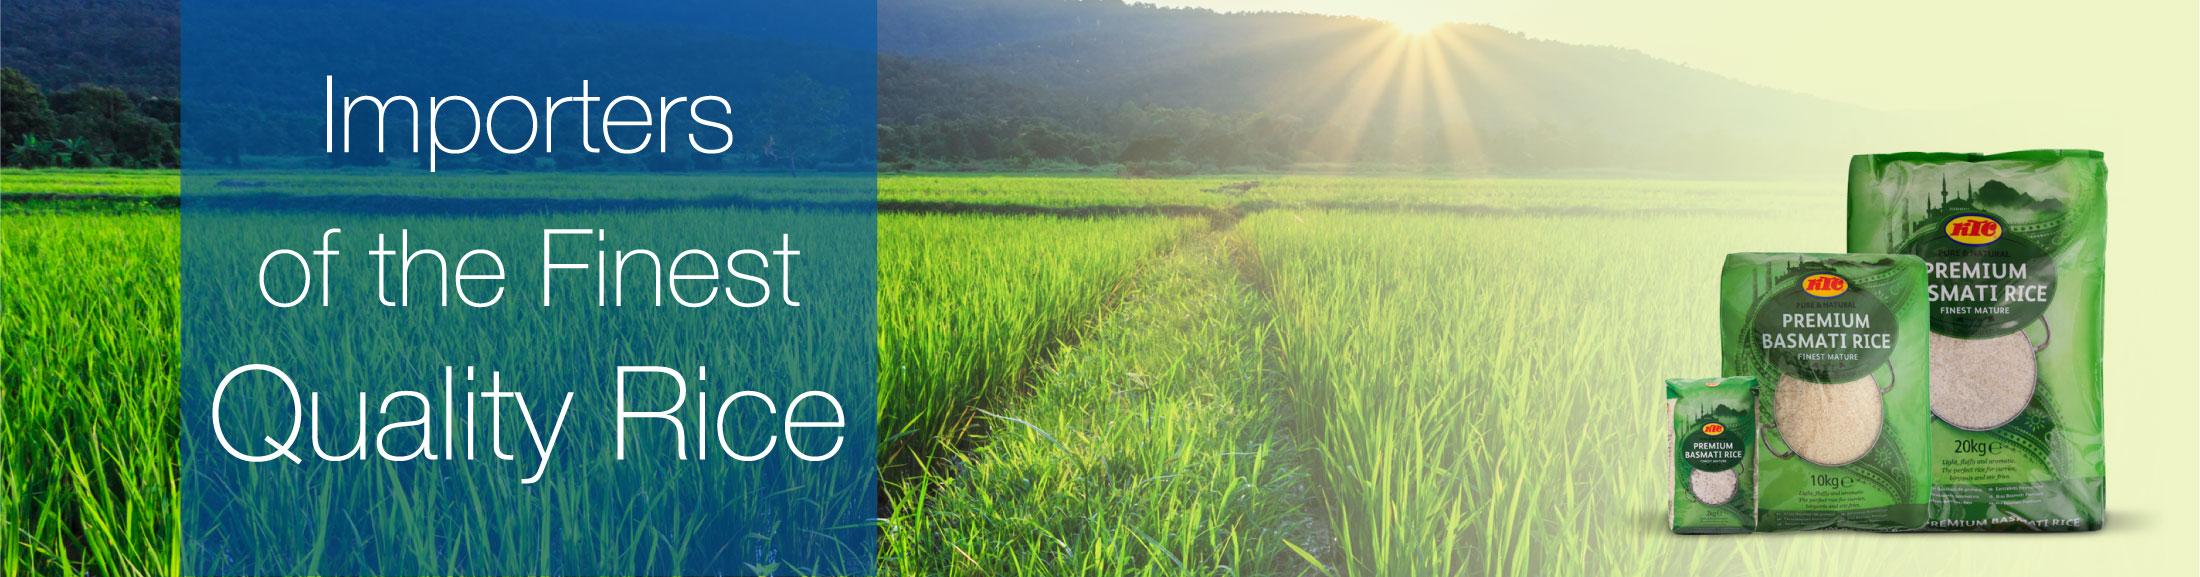 paddy-field-blue